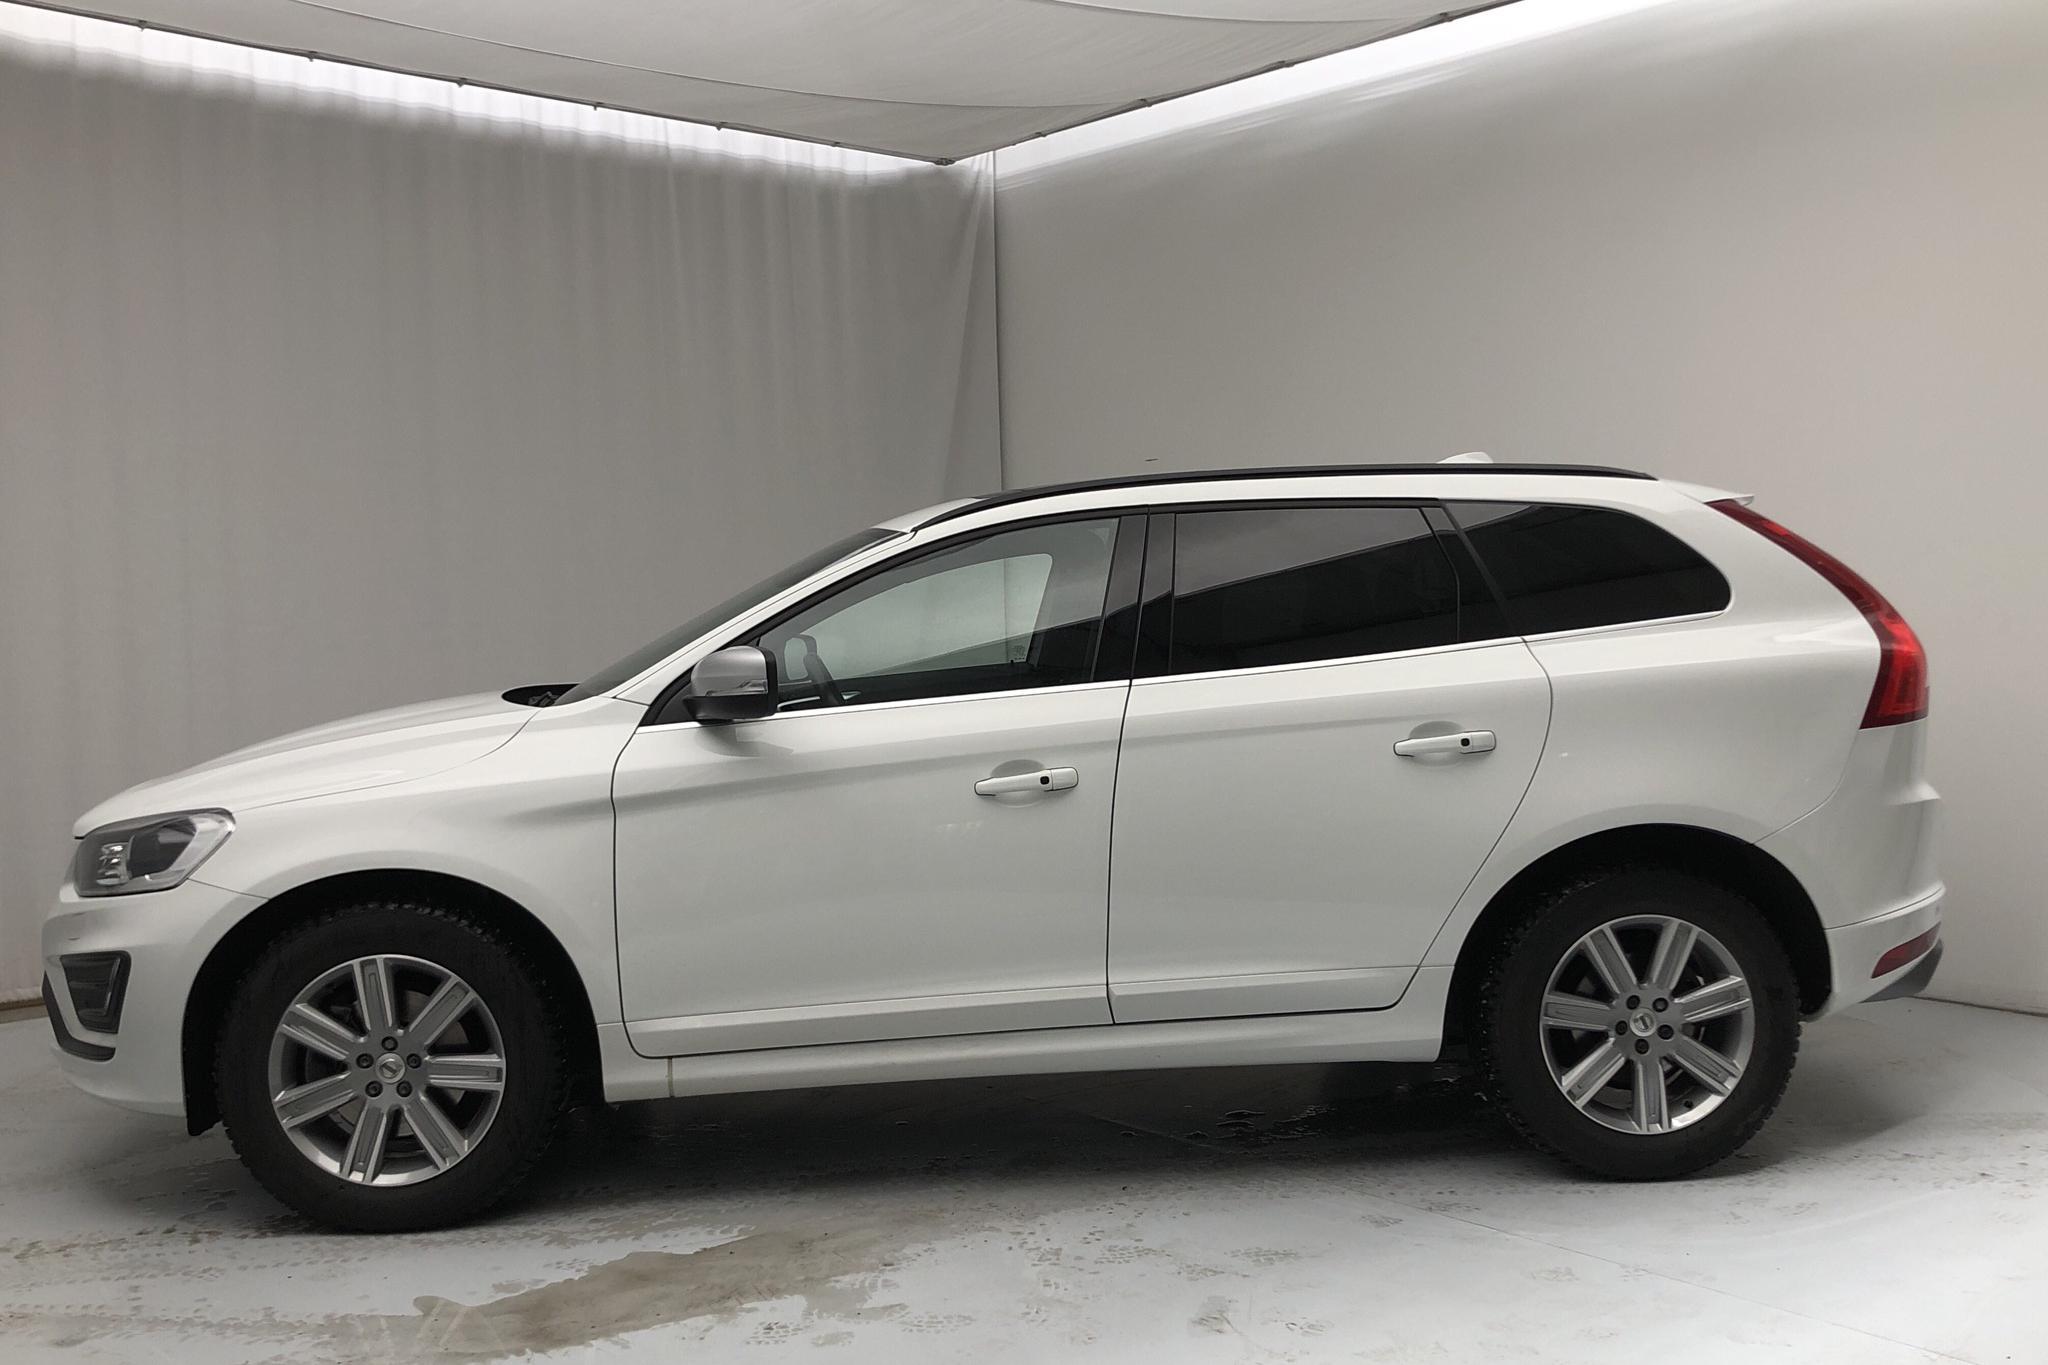 Volvo XC60 D4 AWD (190hk) - 64 790 km - Automatic - white - 2017